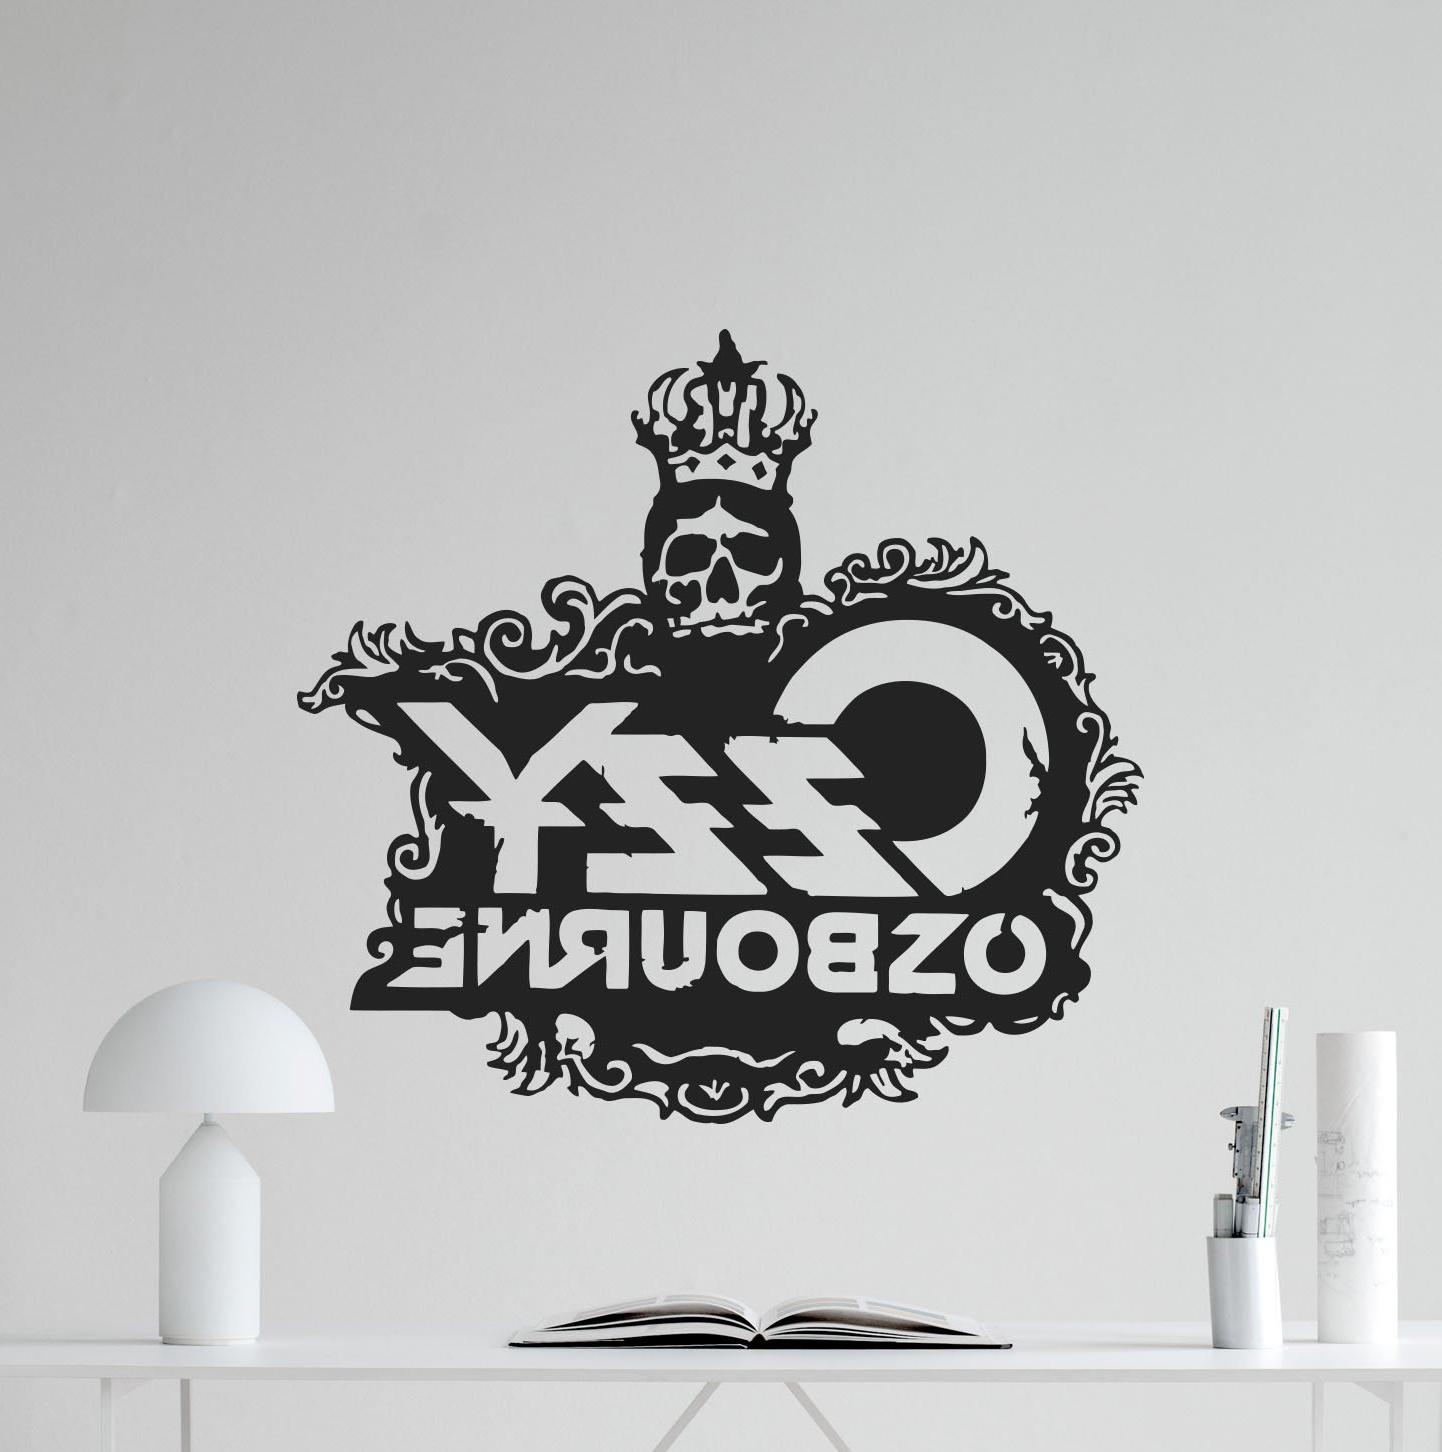 Current Ozzy Osbourne Skull Logo Wall Decal Rock Metal Music Vinyl Sticker Within Osbourne Wall Decor (View 13 of 20)